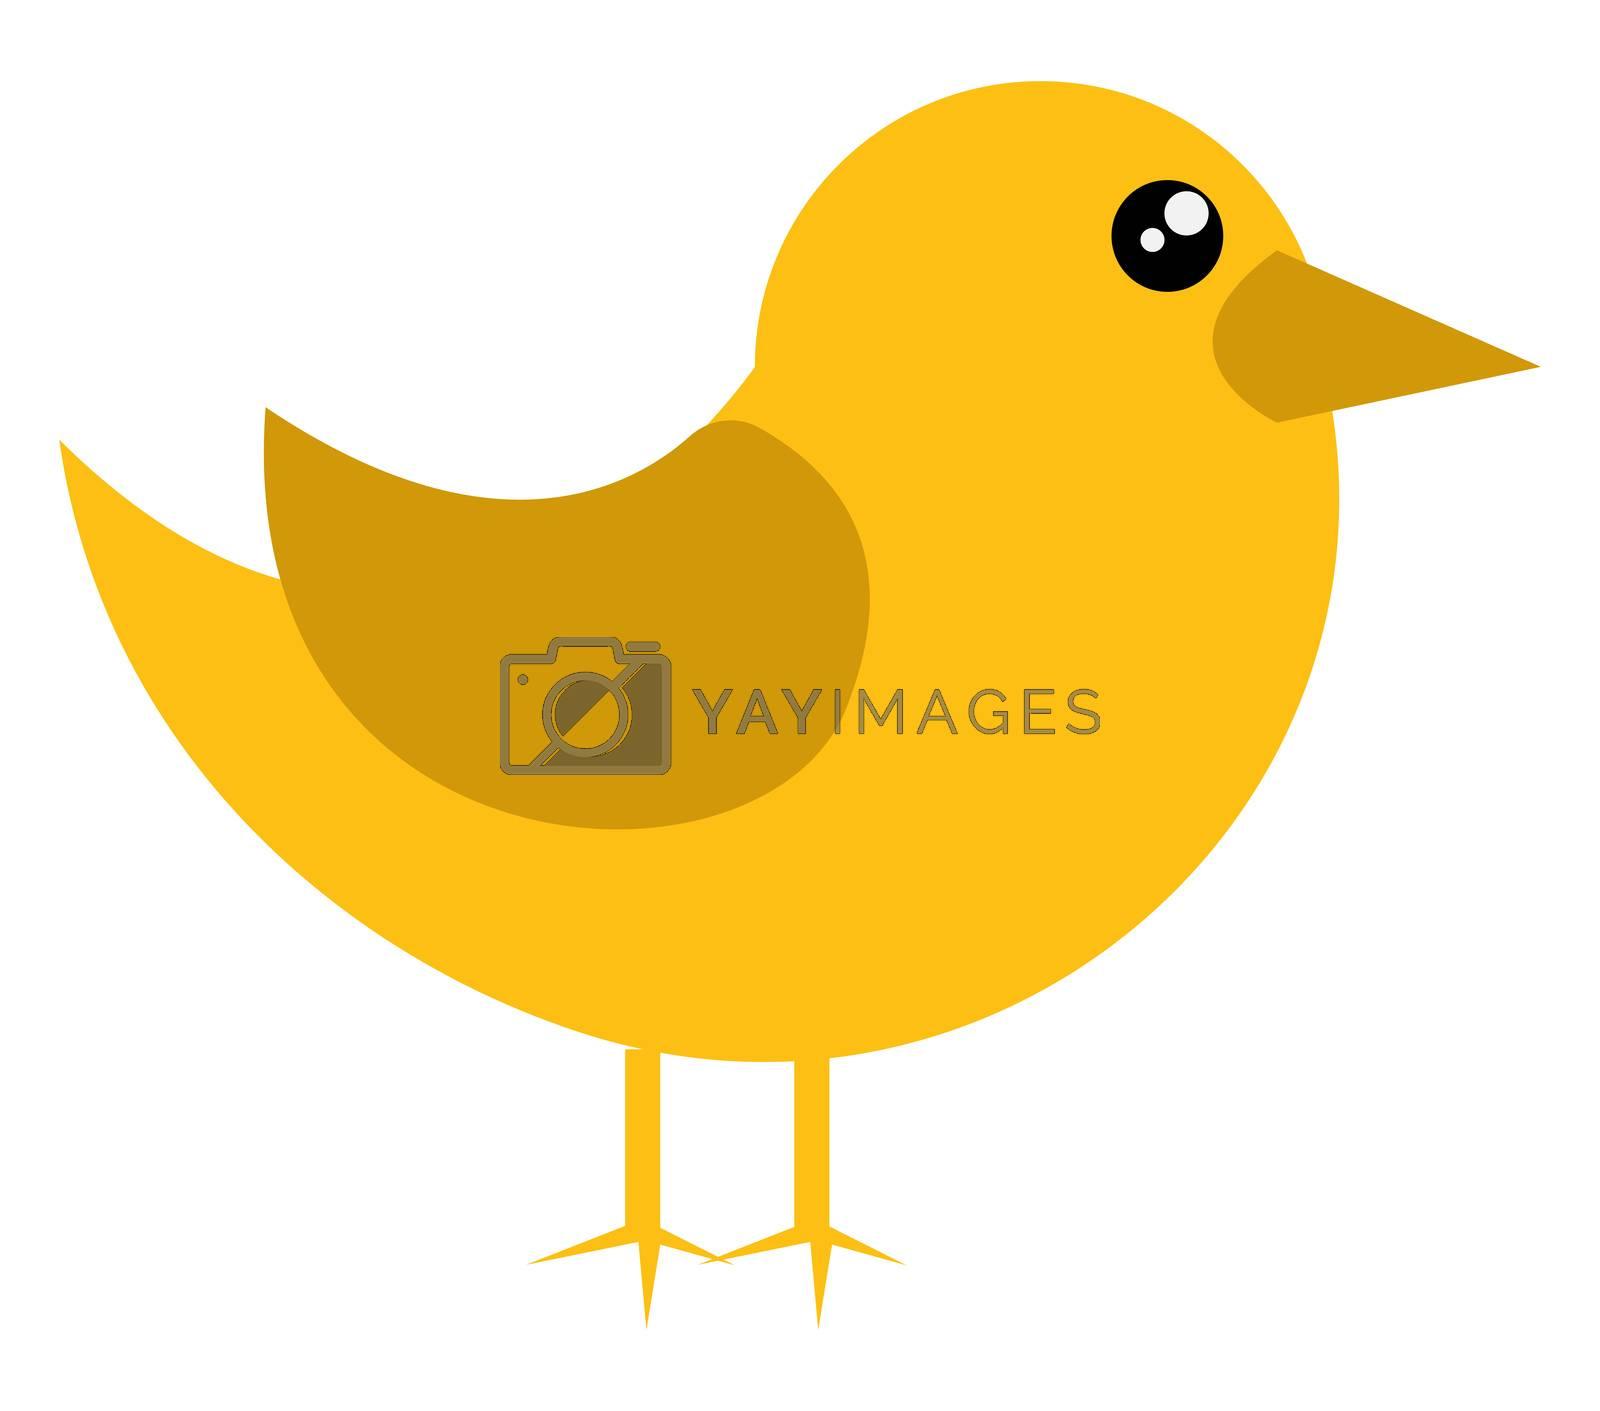 Small yellow bird, illustration, vector on white background